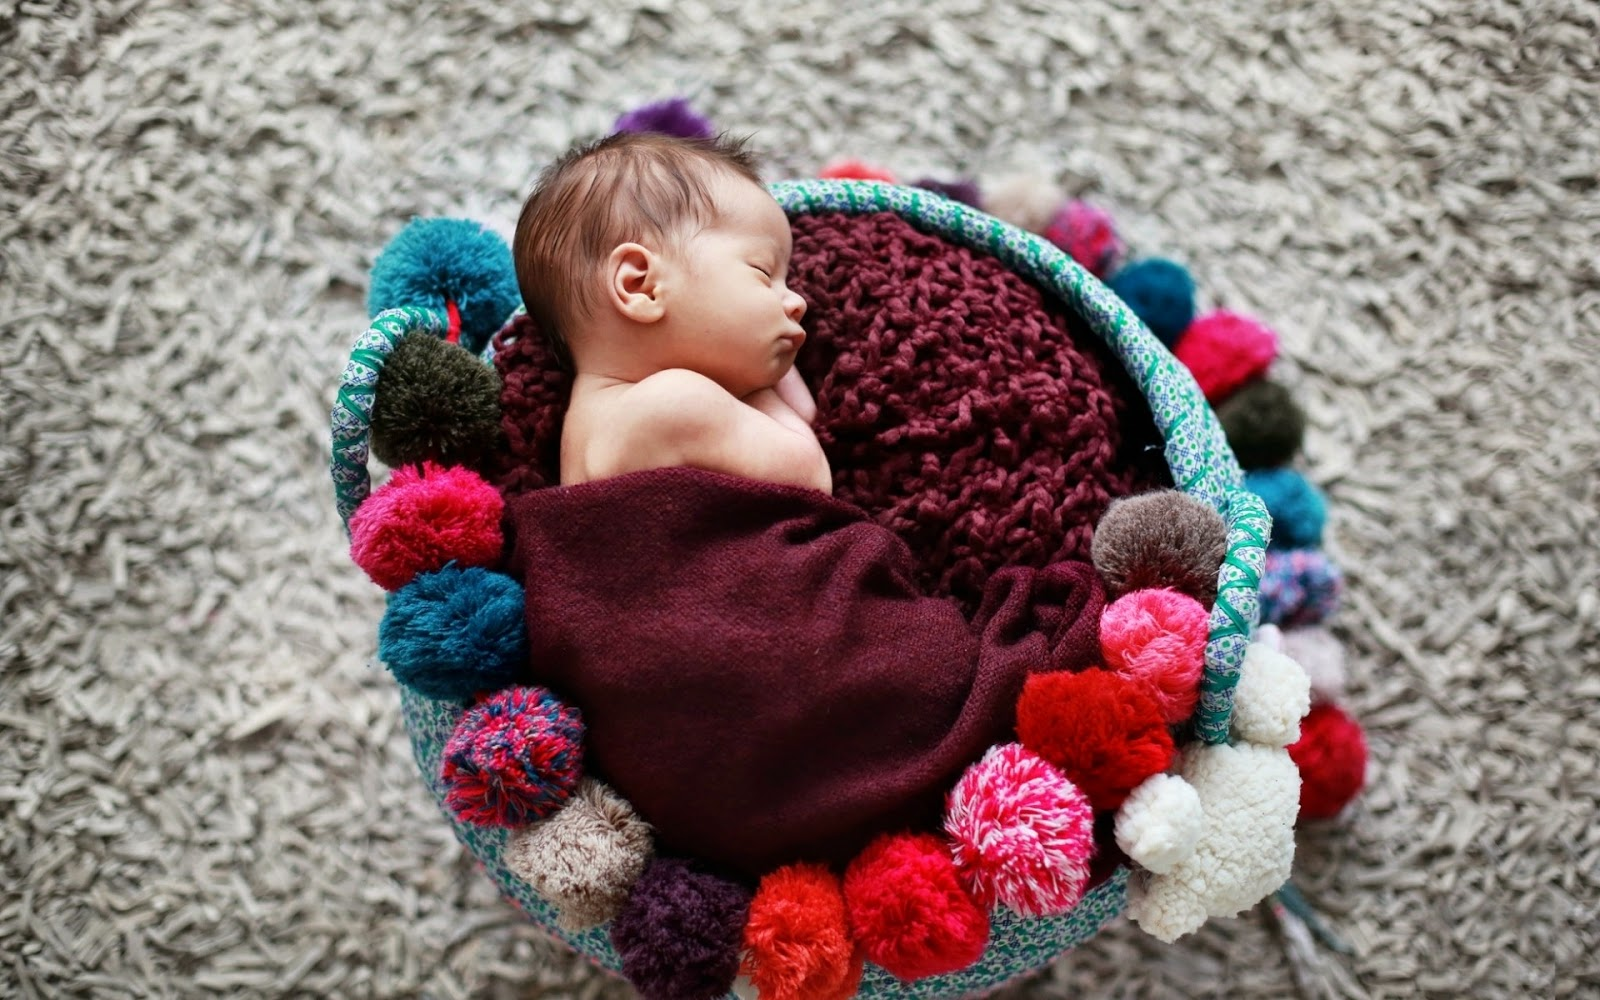 HD-Photography-Images-of-Babies-sleeping.jpg